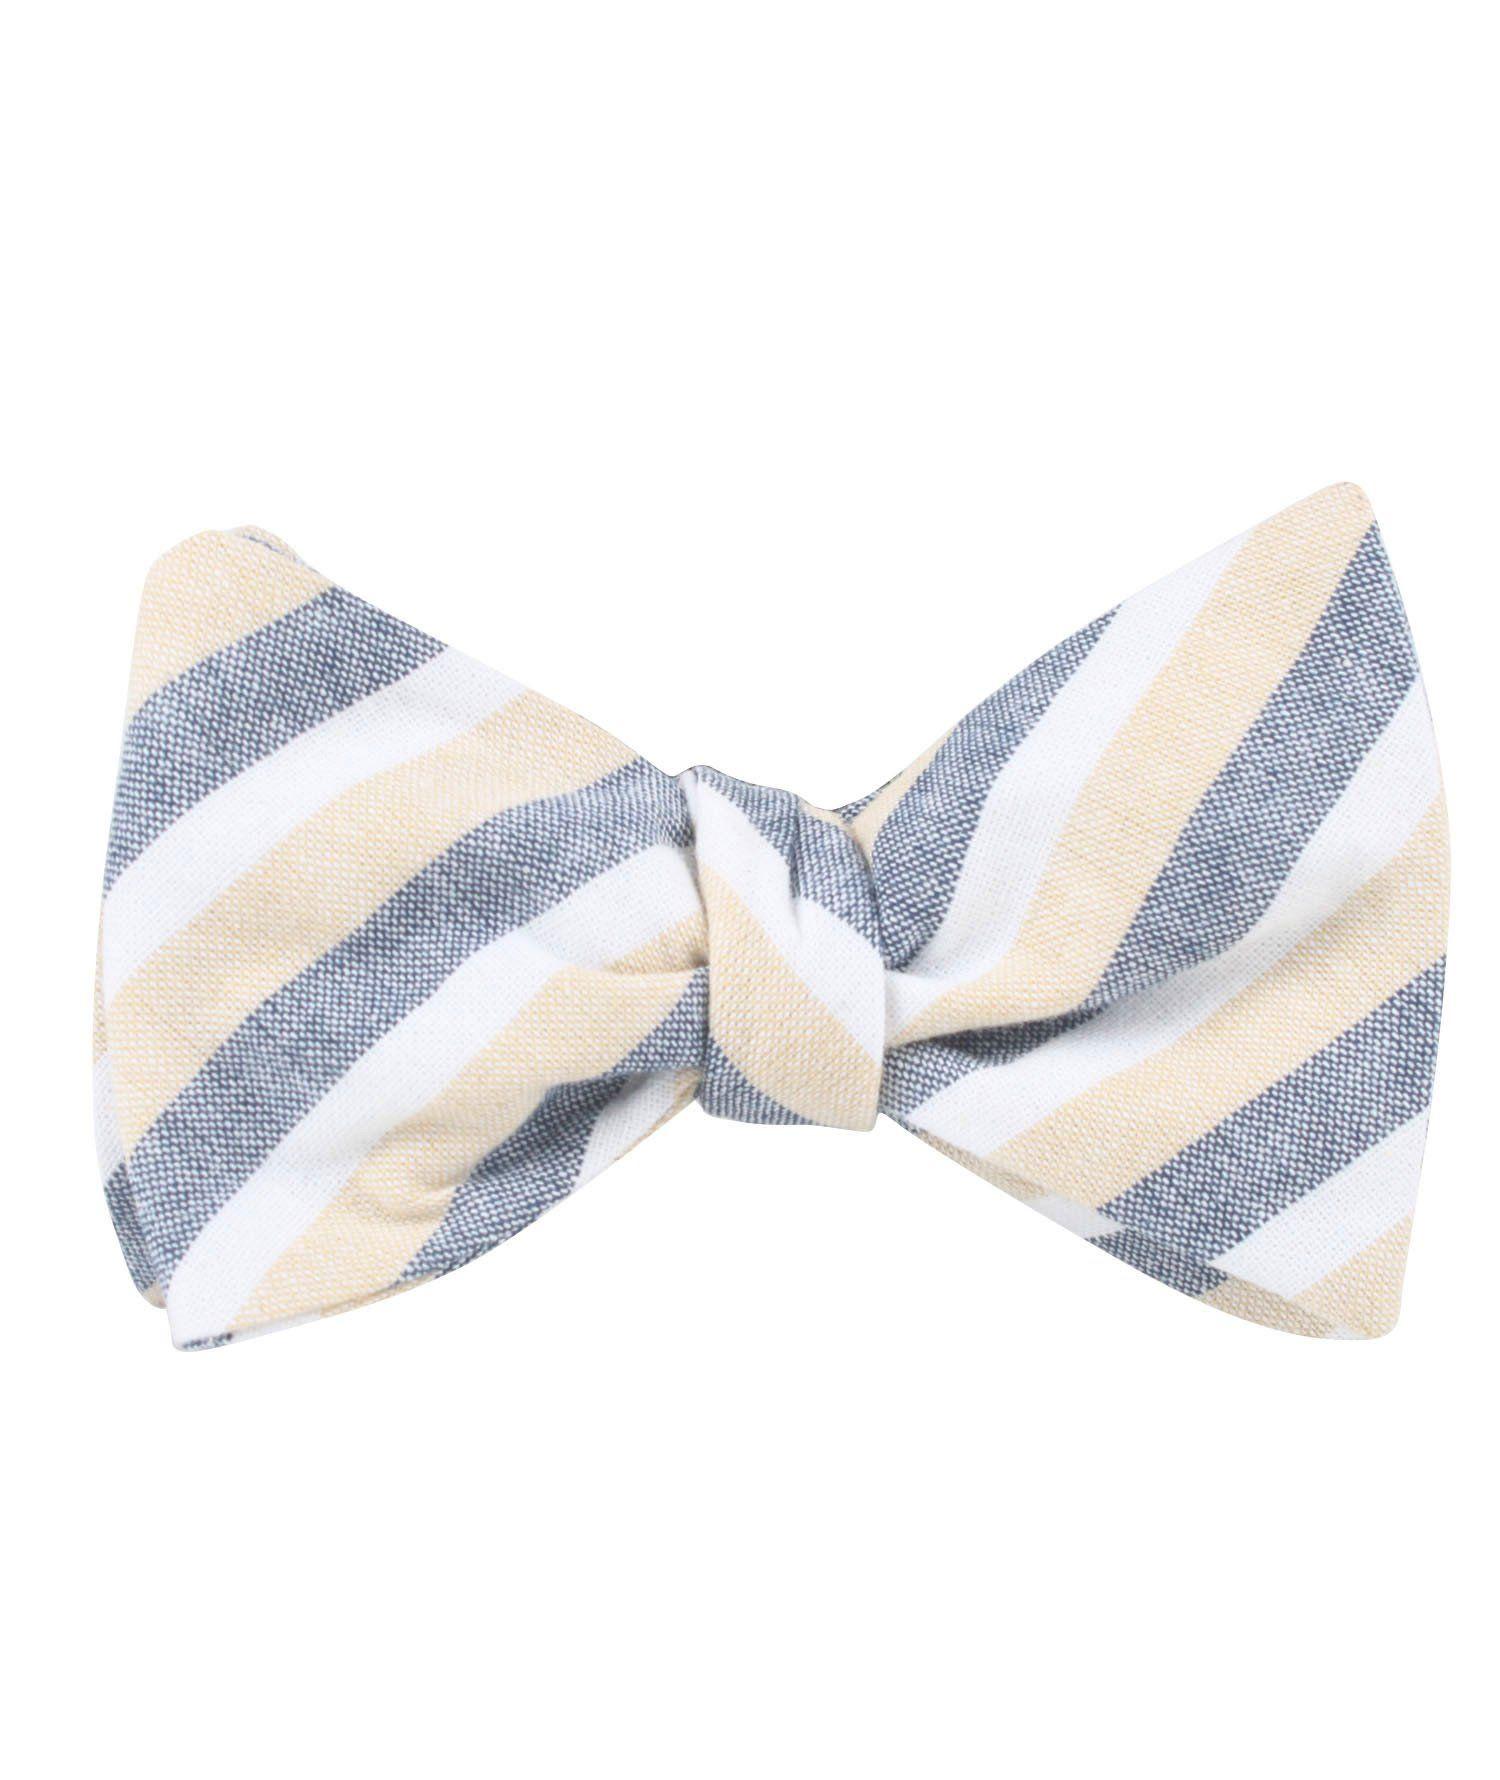 2908123666d8 New York Striped Self Bow Tie   Men's Tuxedo Suit Bow Ties UnTied for Men